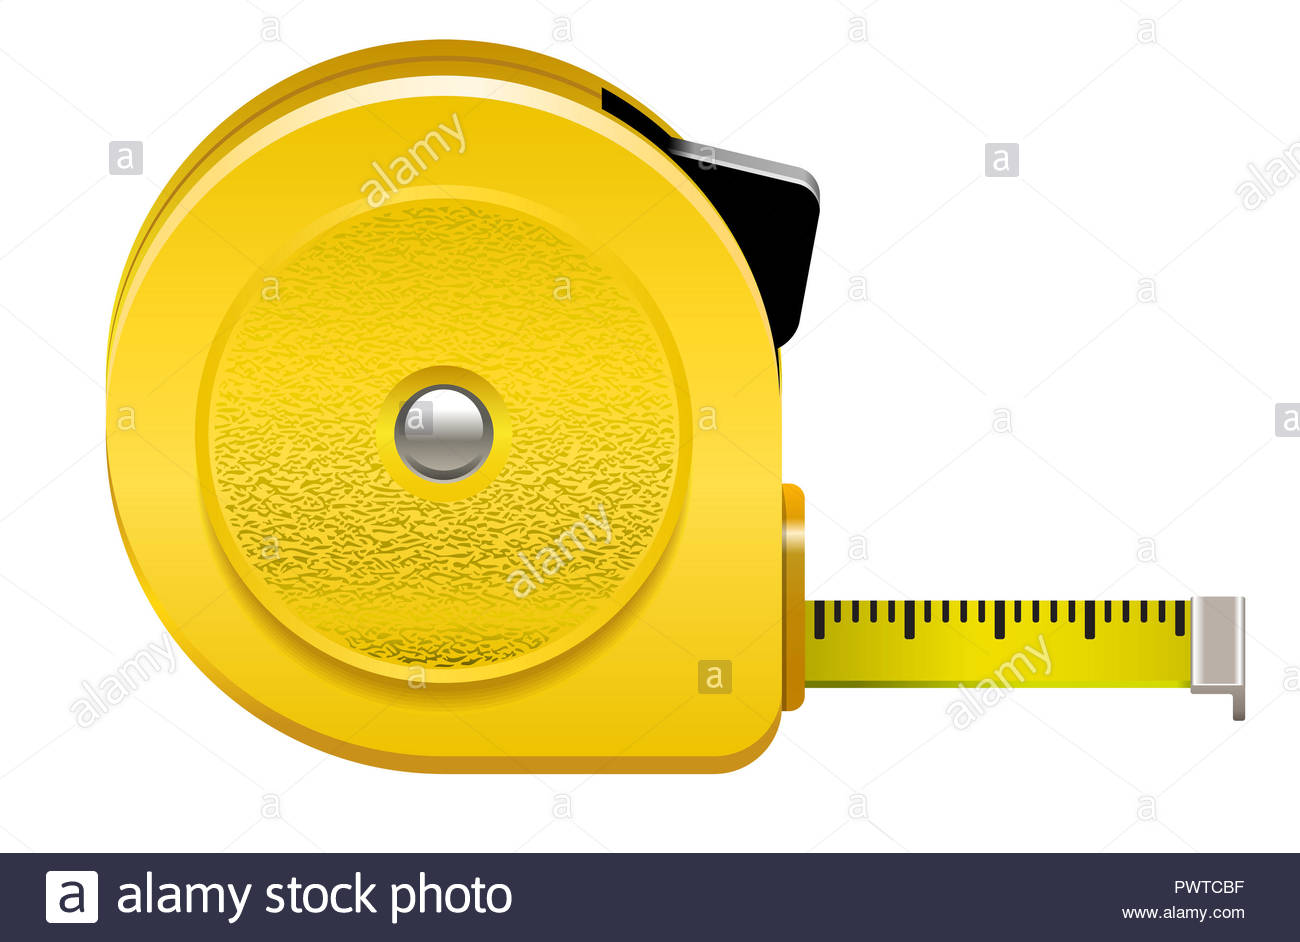 roulette meter measure construction tool precision illustration - Stock Image